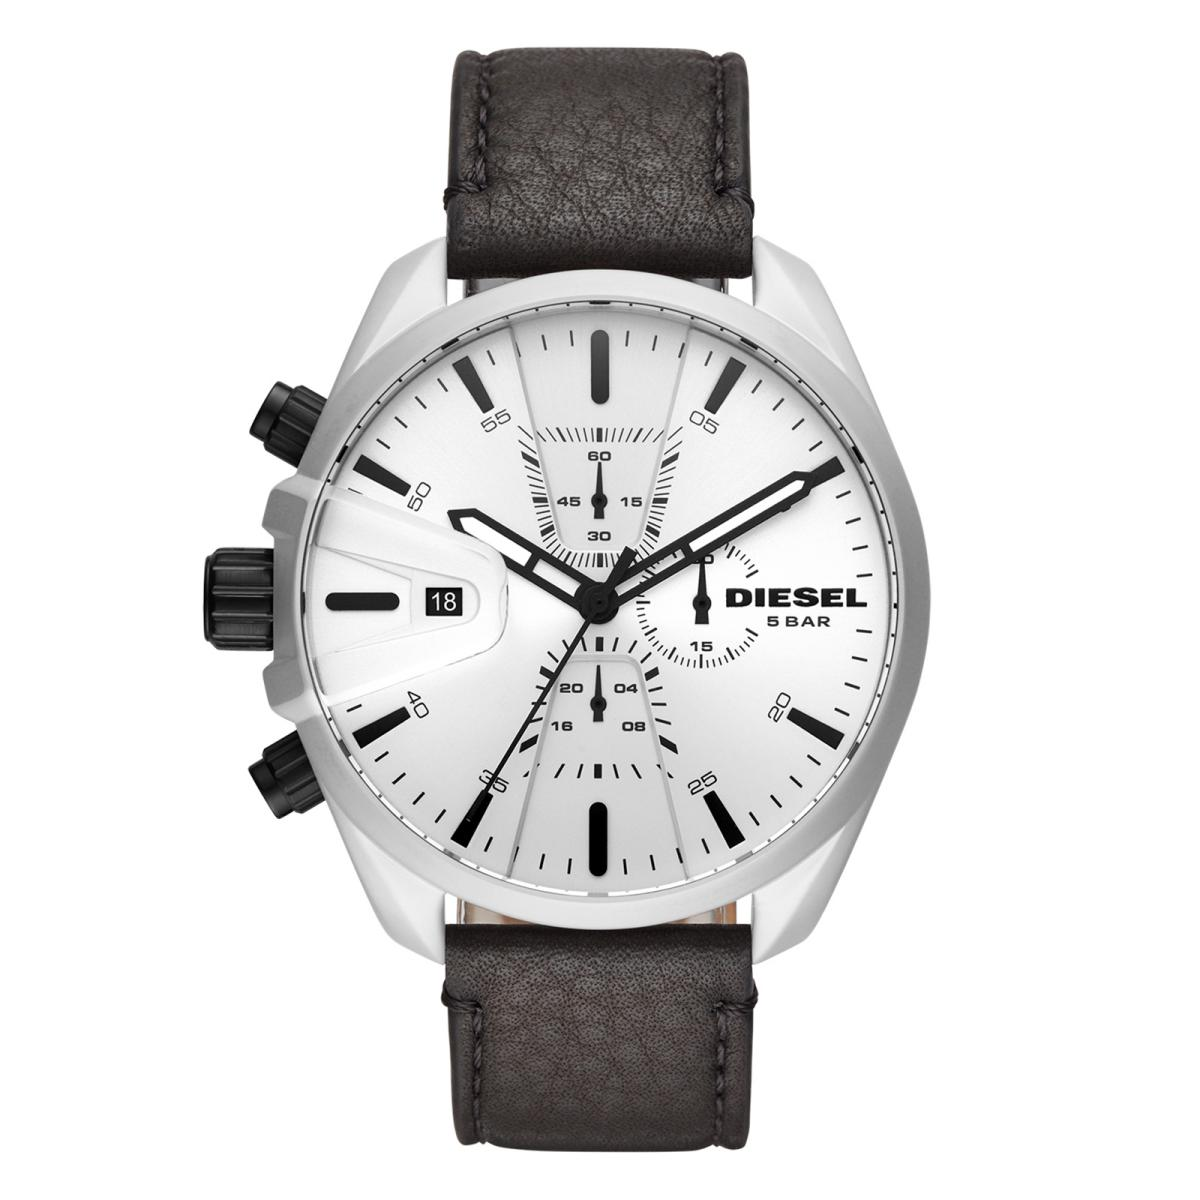 1e12259eab13 Reloj Diesel - DZ4505 - Hombre - Time Square